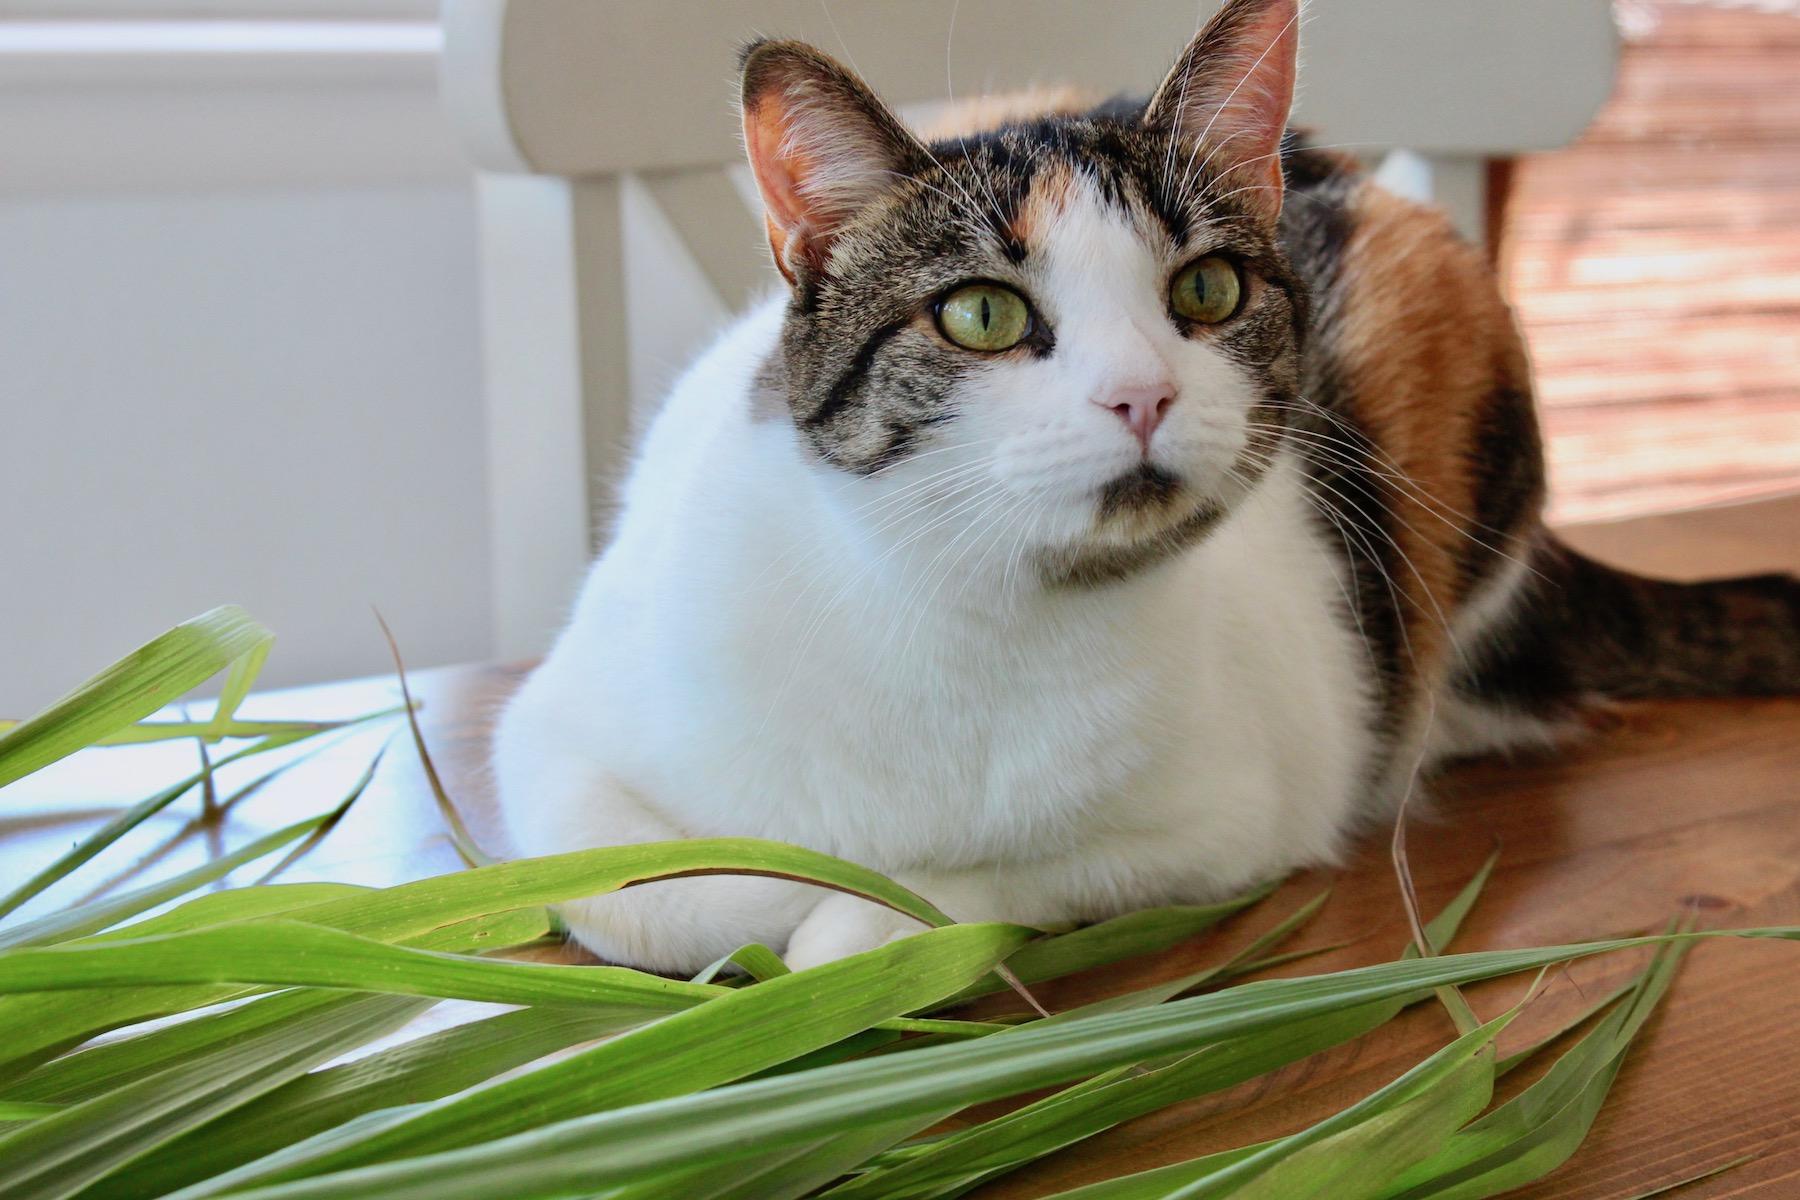 Lemongrass and Kitty